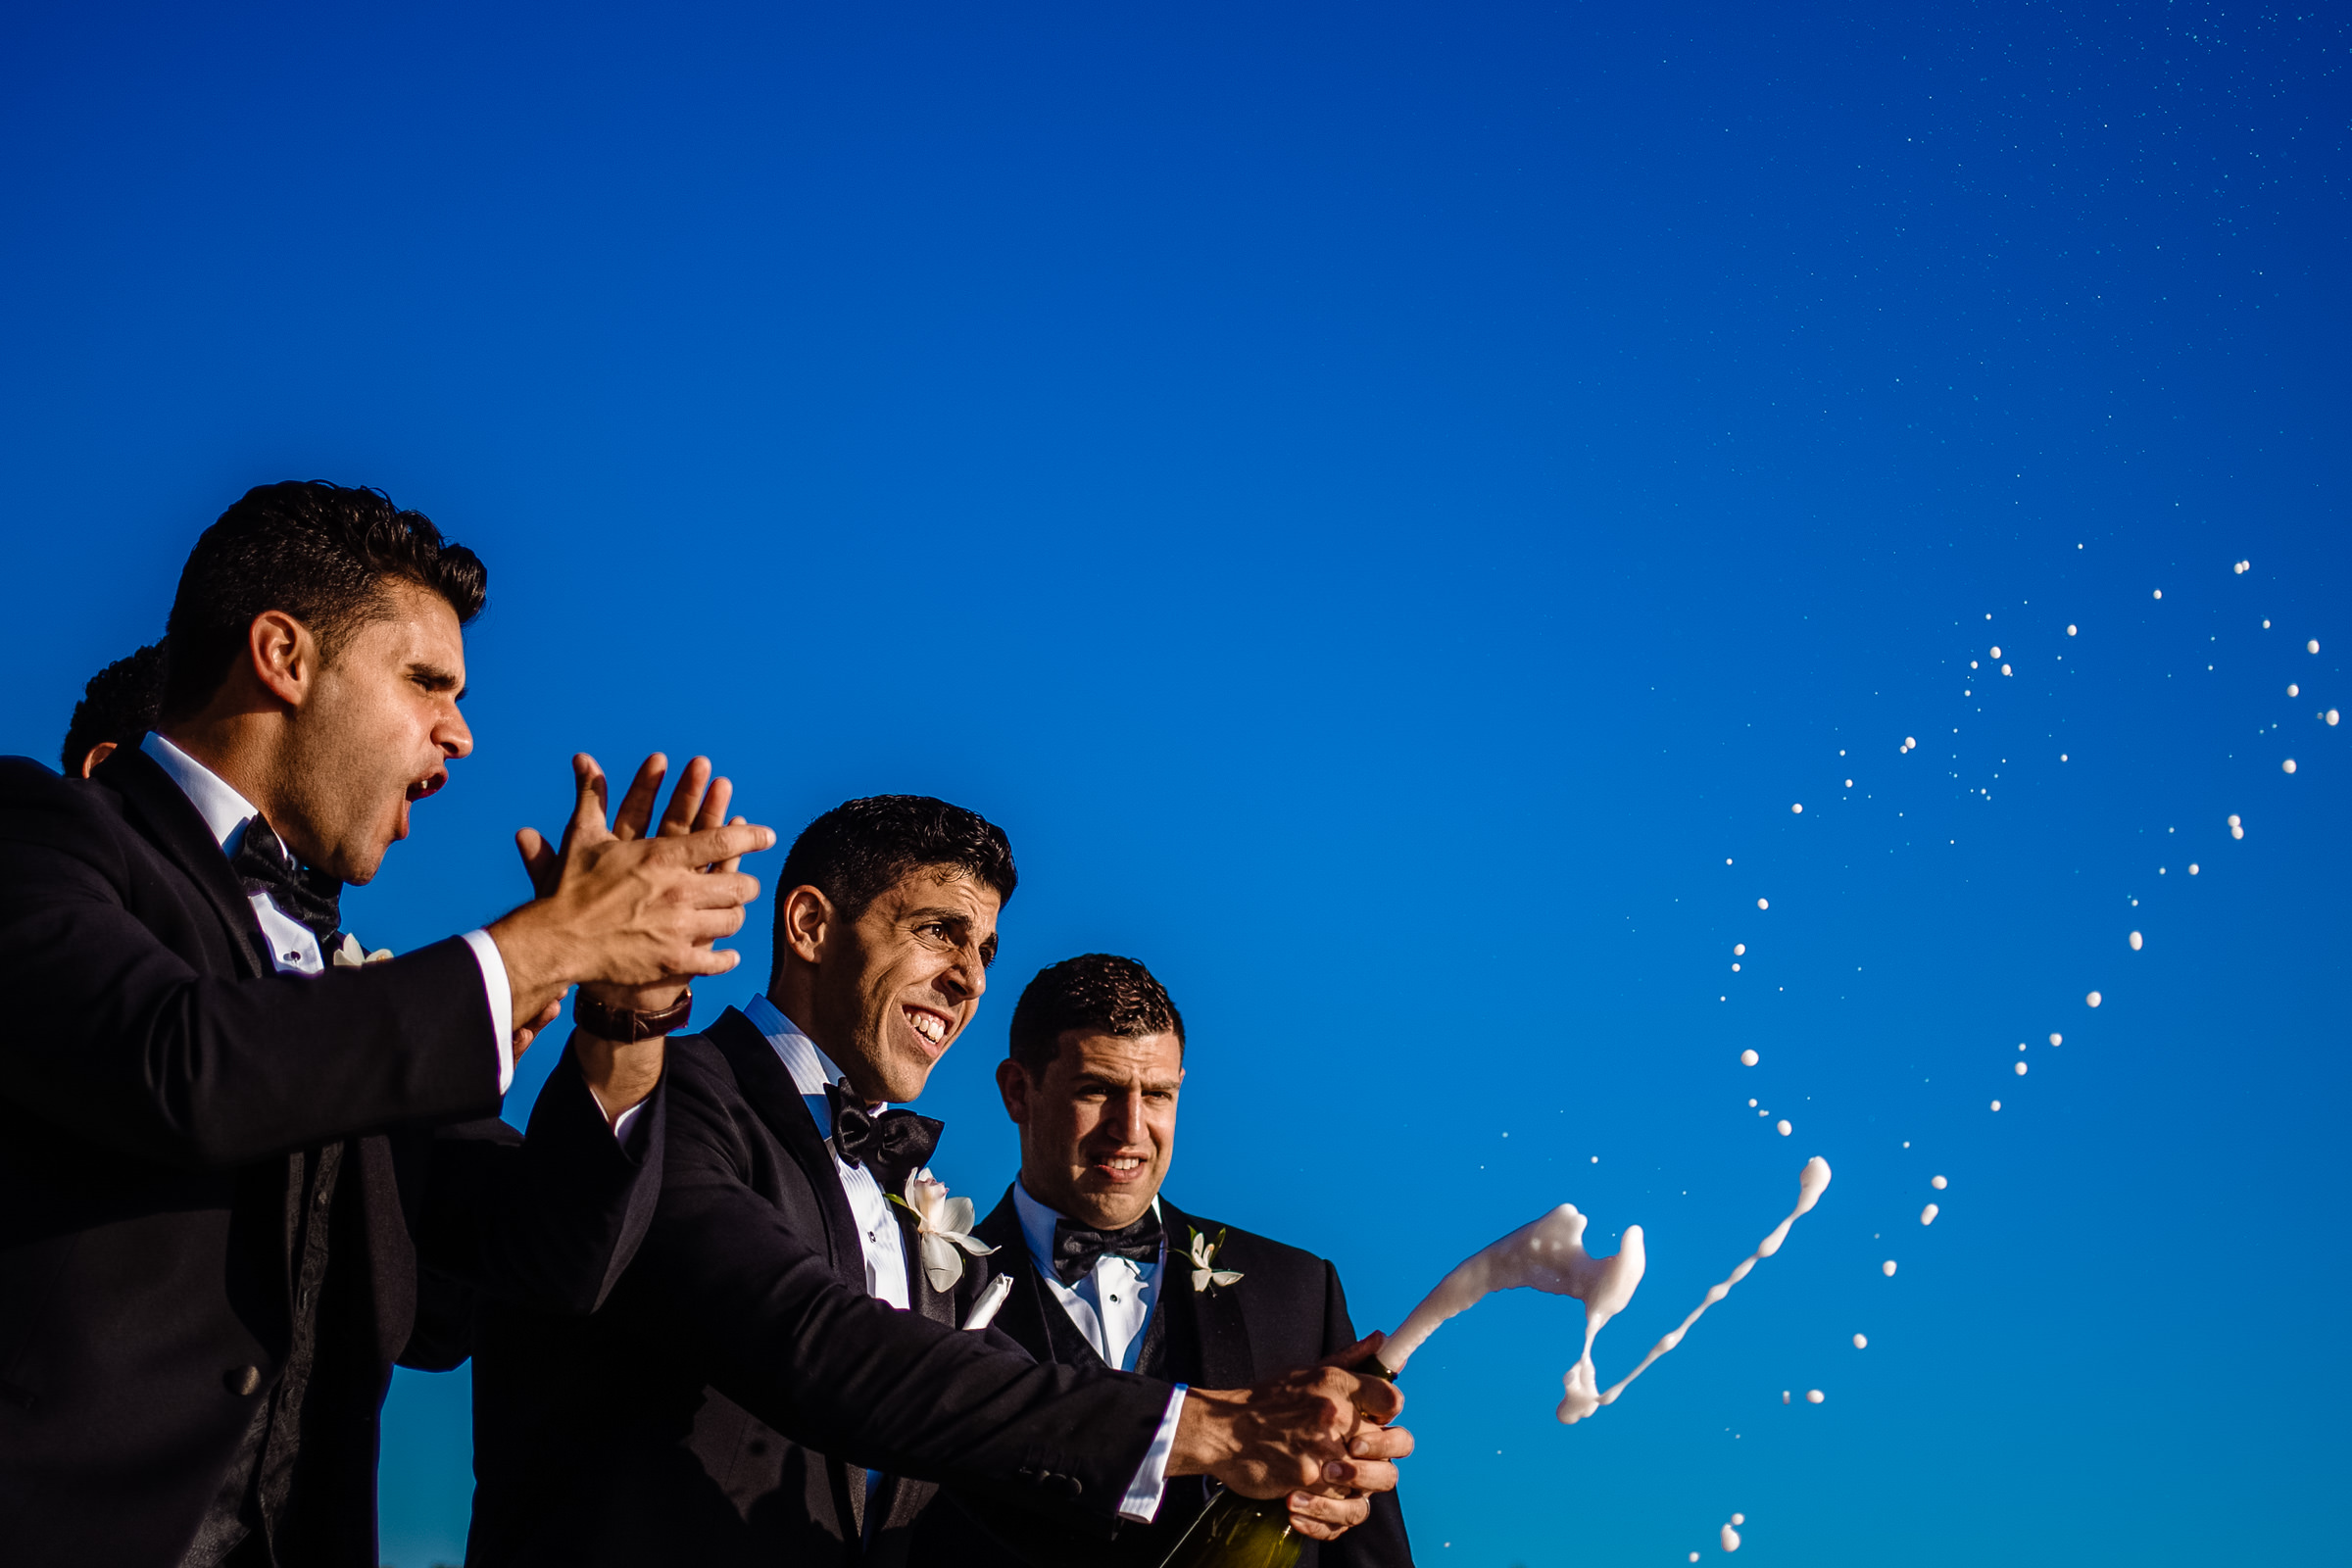 Groomsmen popping champagne - Photo by Wainwright Weddings